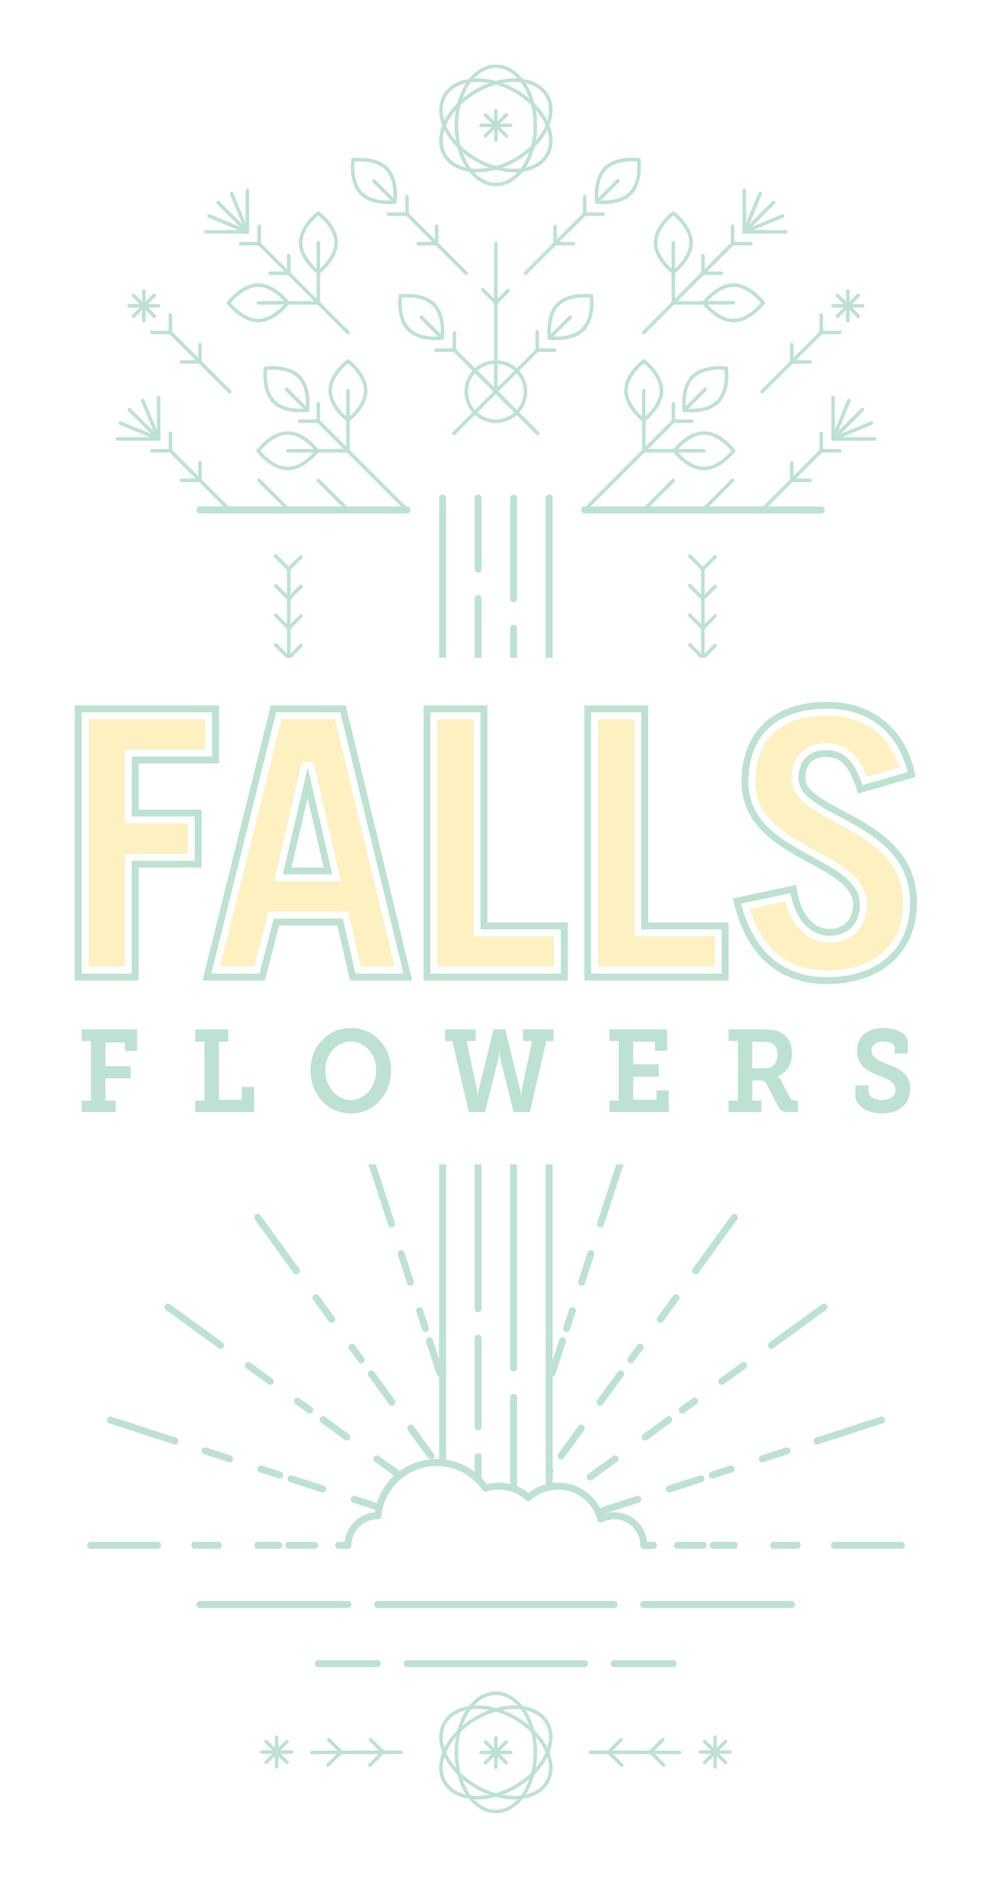 falls flowers full logo jolly edition branding